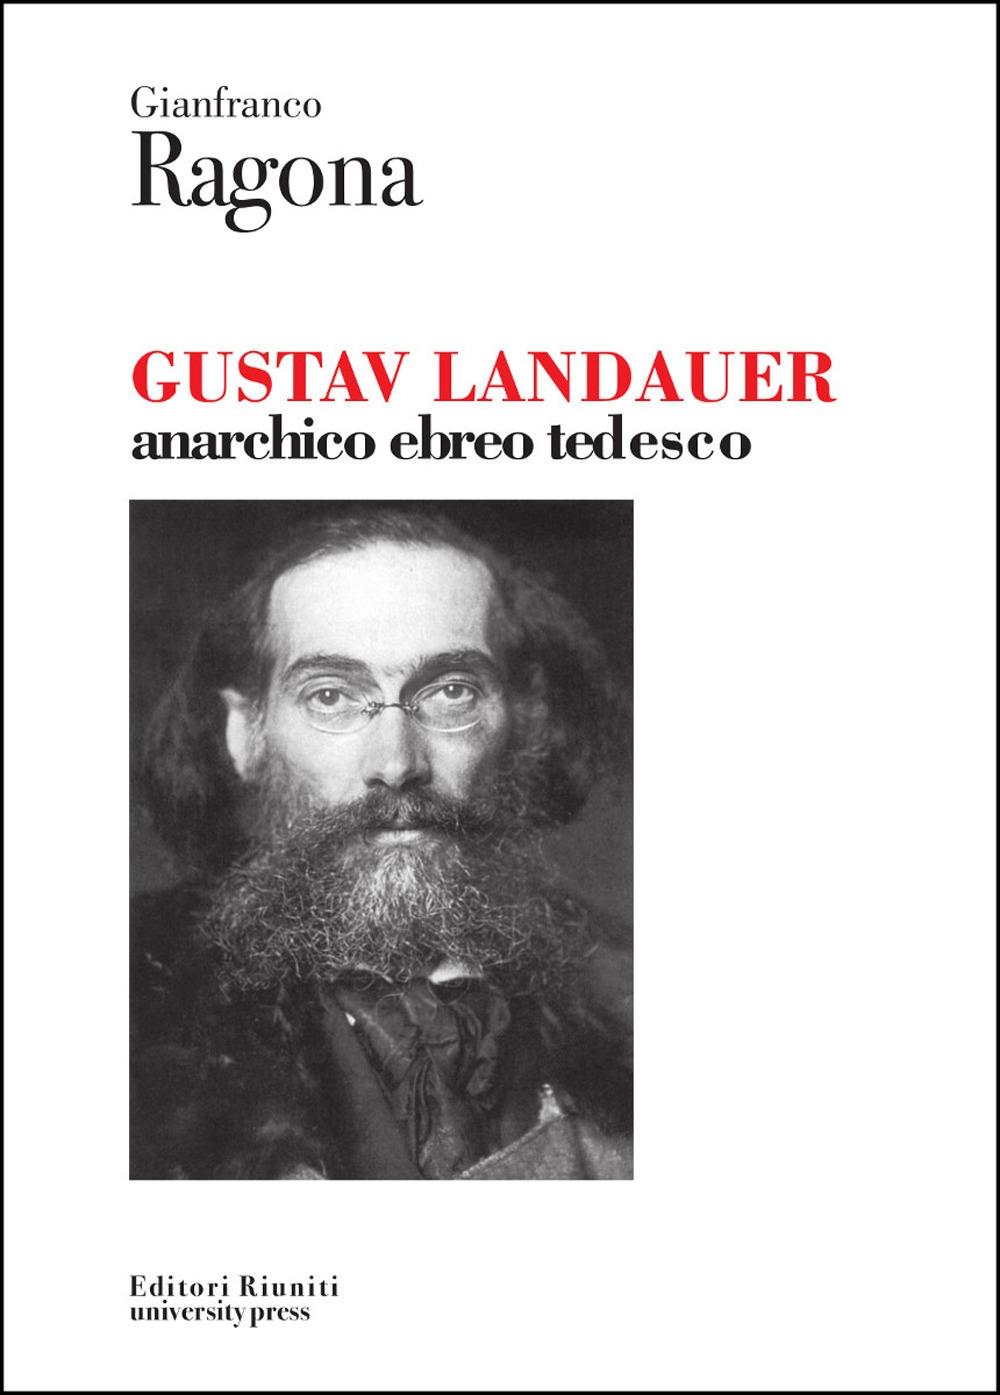 Gustav Landauer. Anarchico, ebreo, tedesco